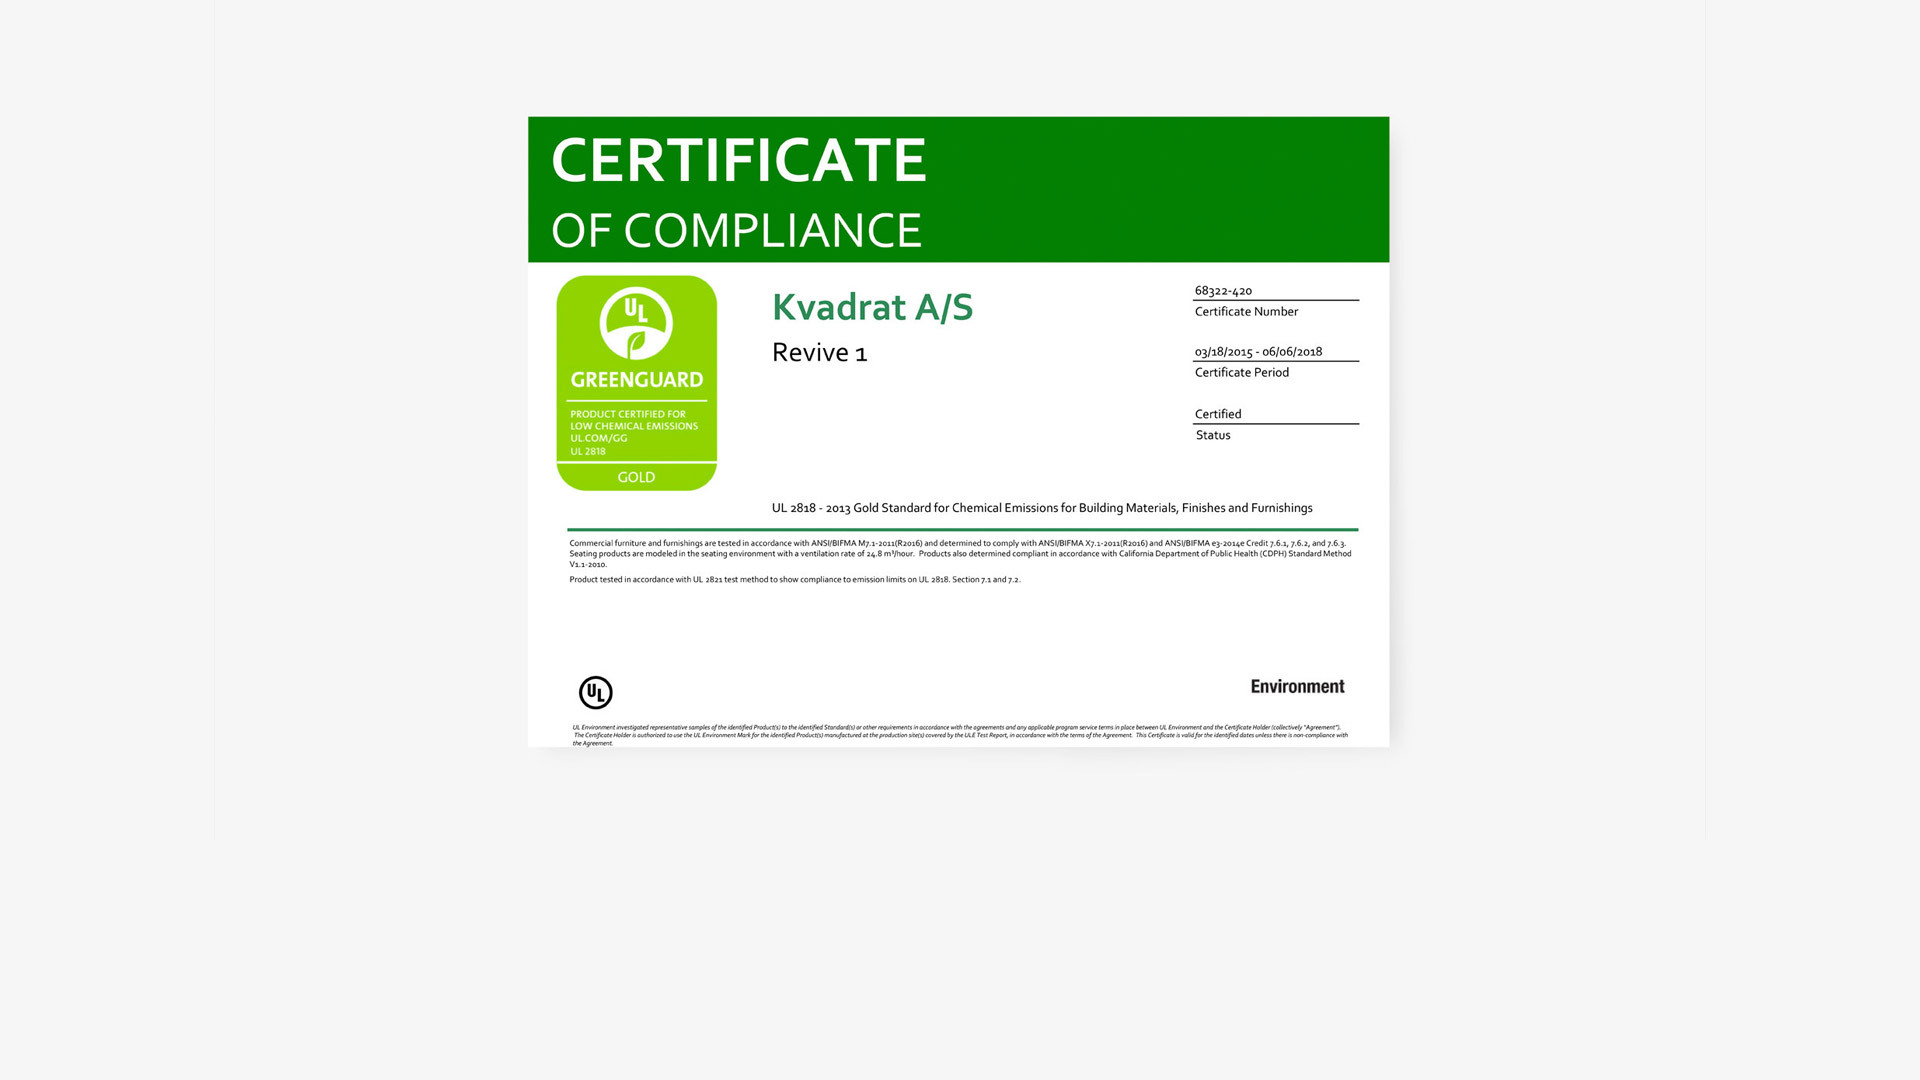 GREENGUARD空气质量权威认证